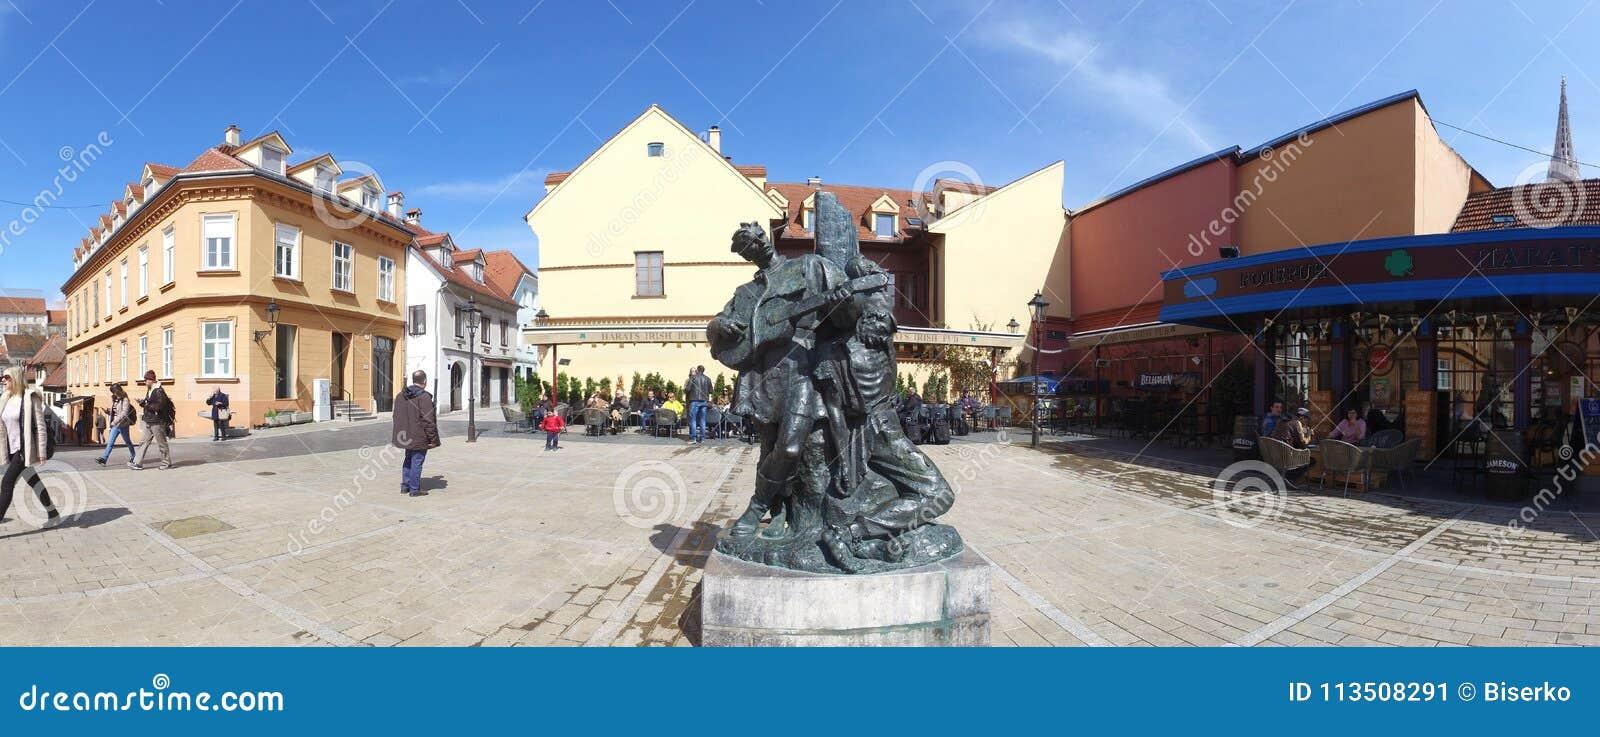 Petrica Kerempuh Monument In Zagreb Croatia Editorial Photo